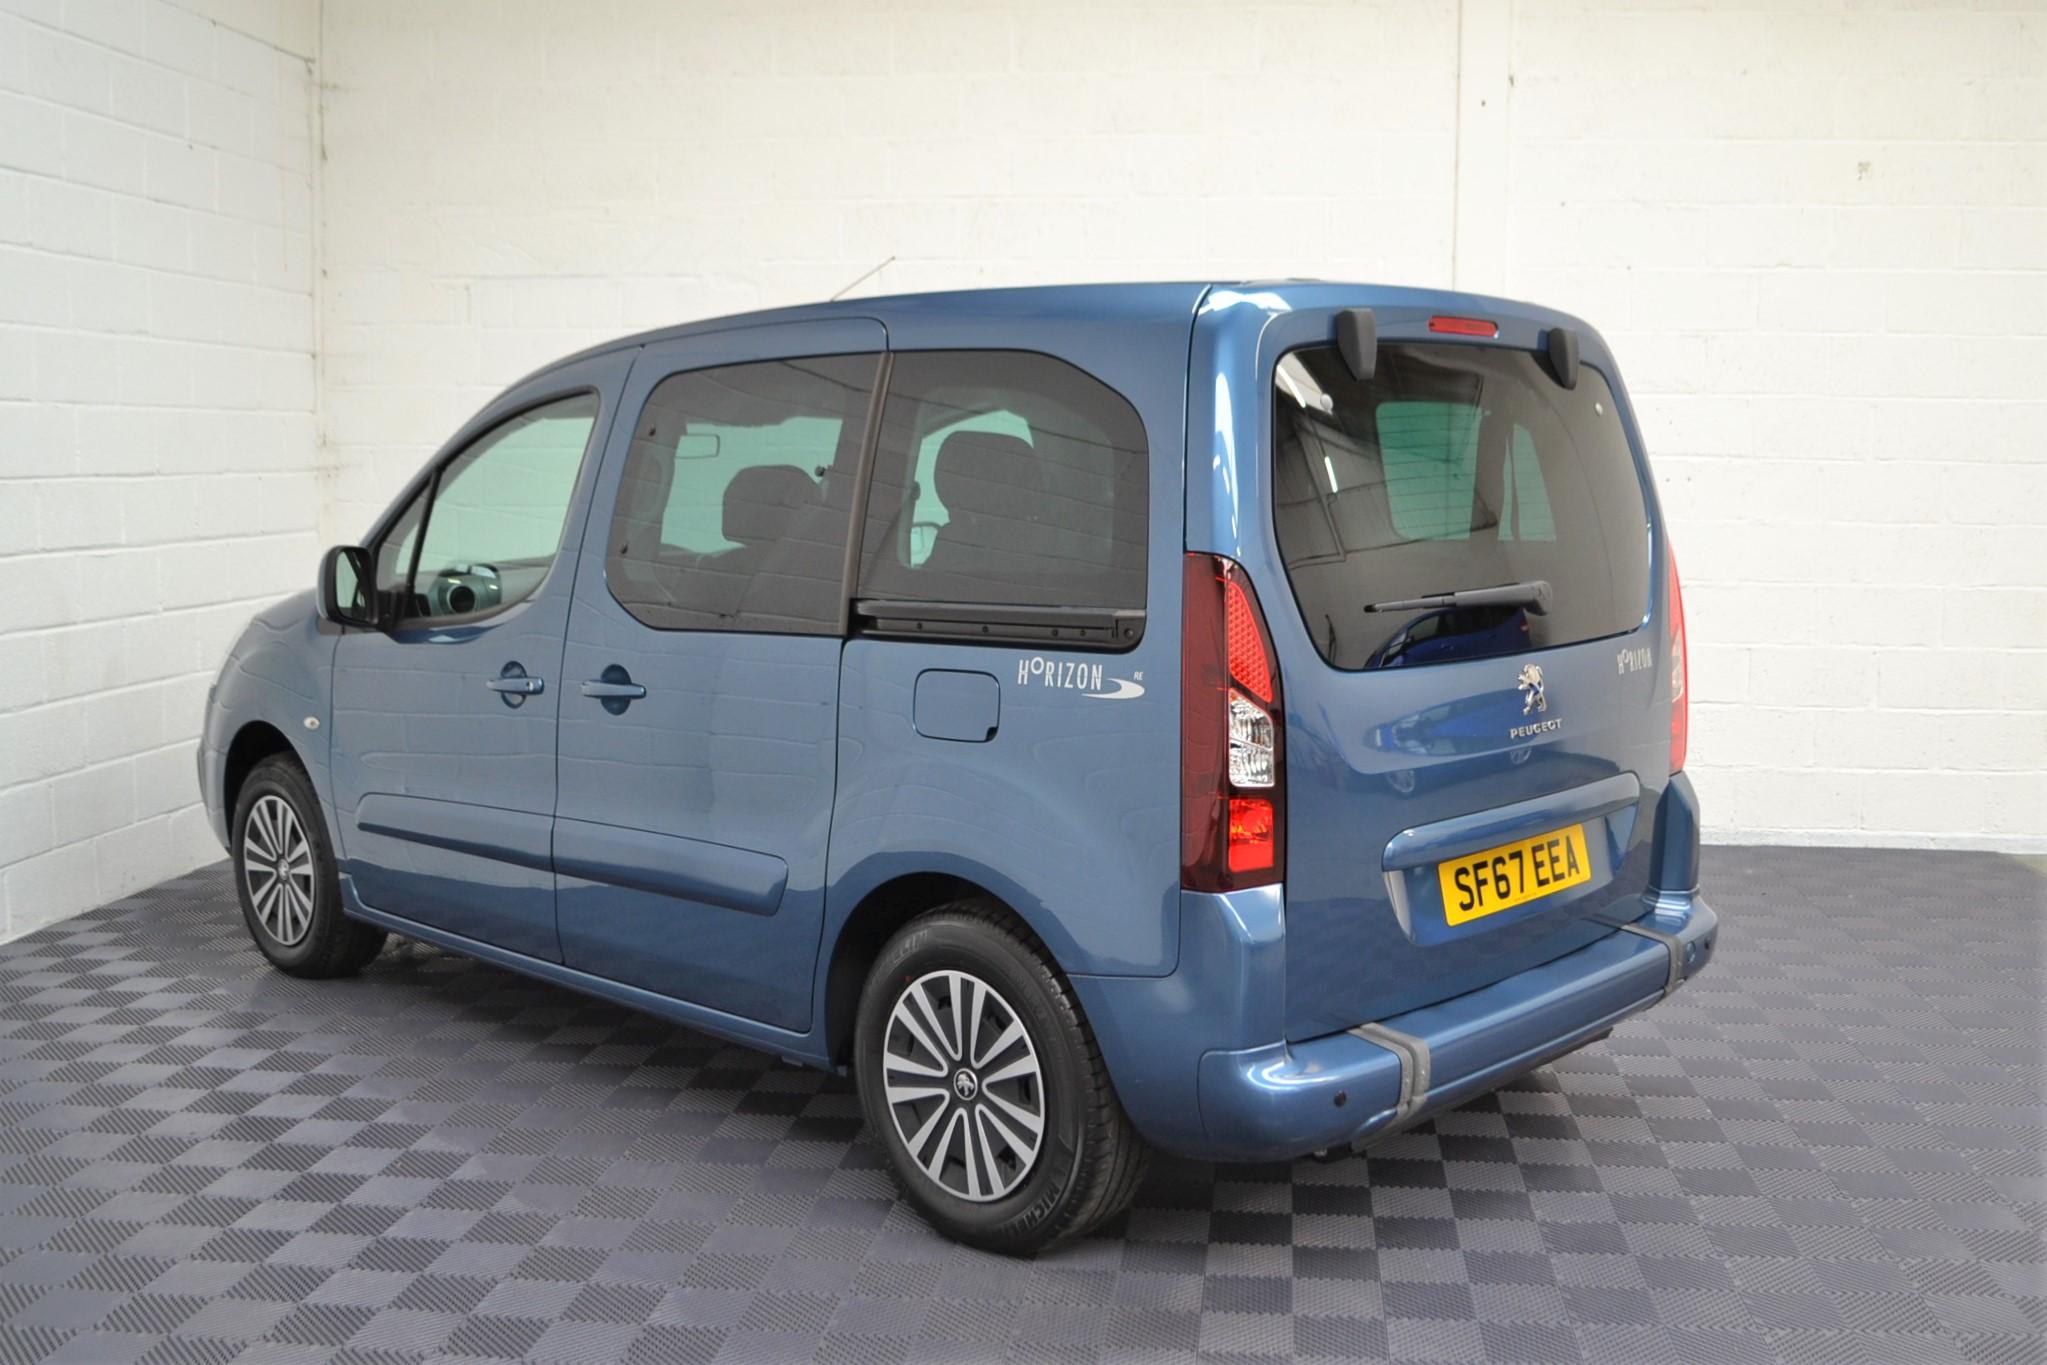 WAV Cars For Sale Bristol Wheelchair Accessible Vehicles Used For Sale Somerset Devon Dorset Bath Peugeot Partner SF67 EEA 8